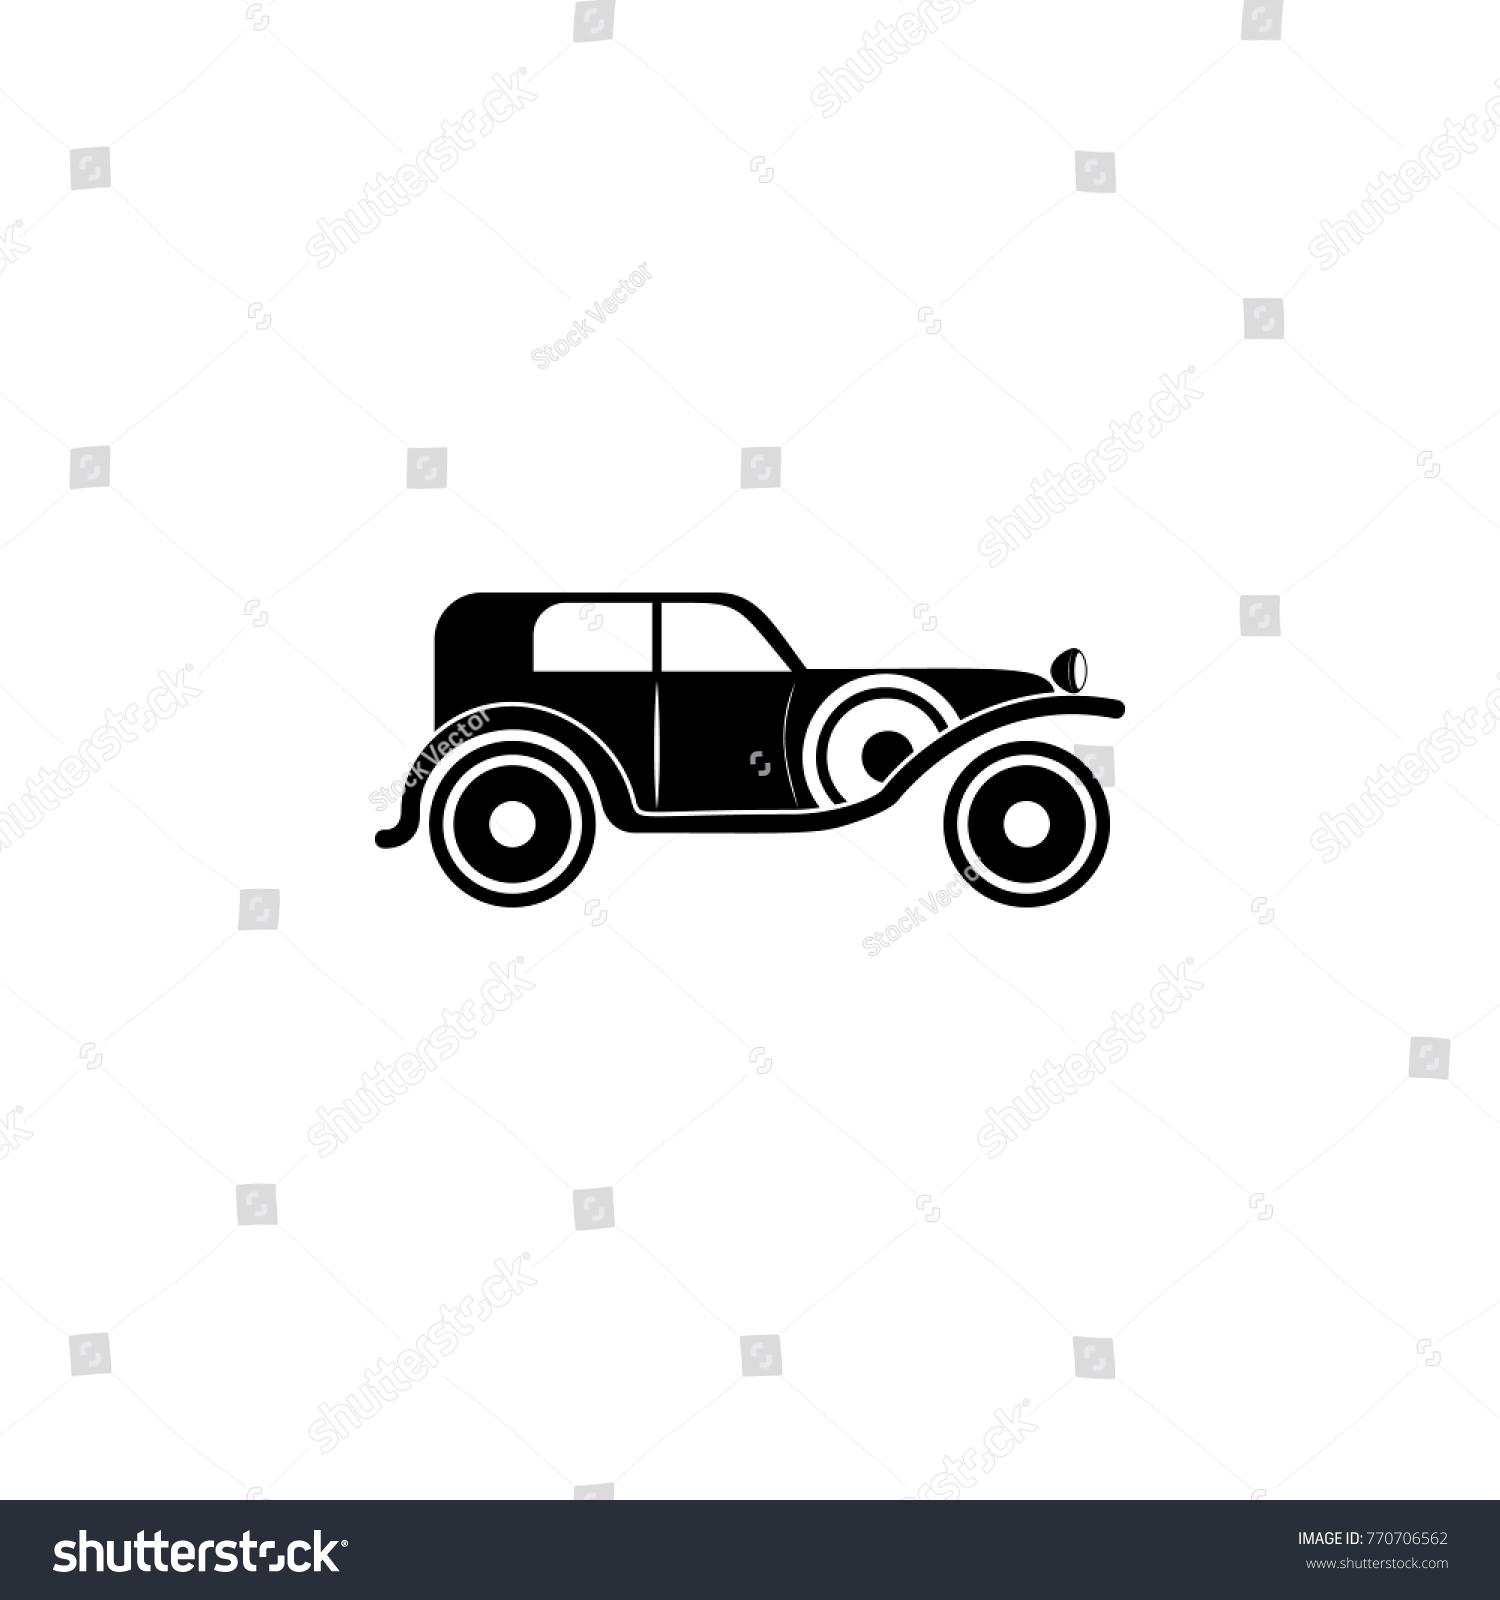 Vintage Car Icon Transport Elements Premium Stock Vector 770706562 ...